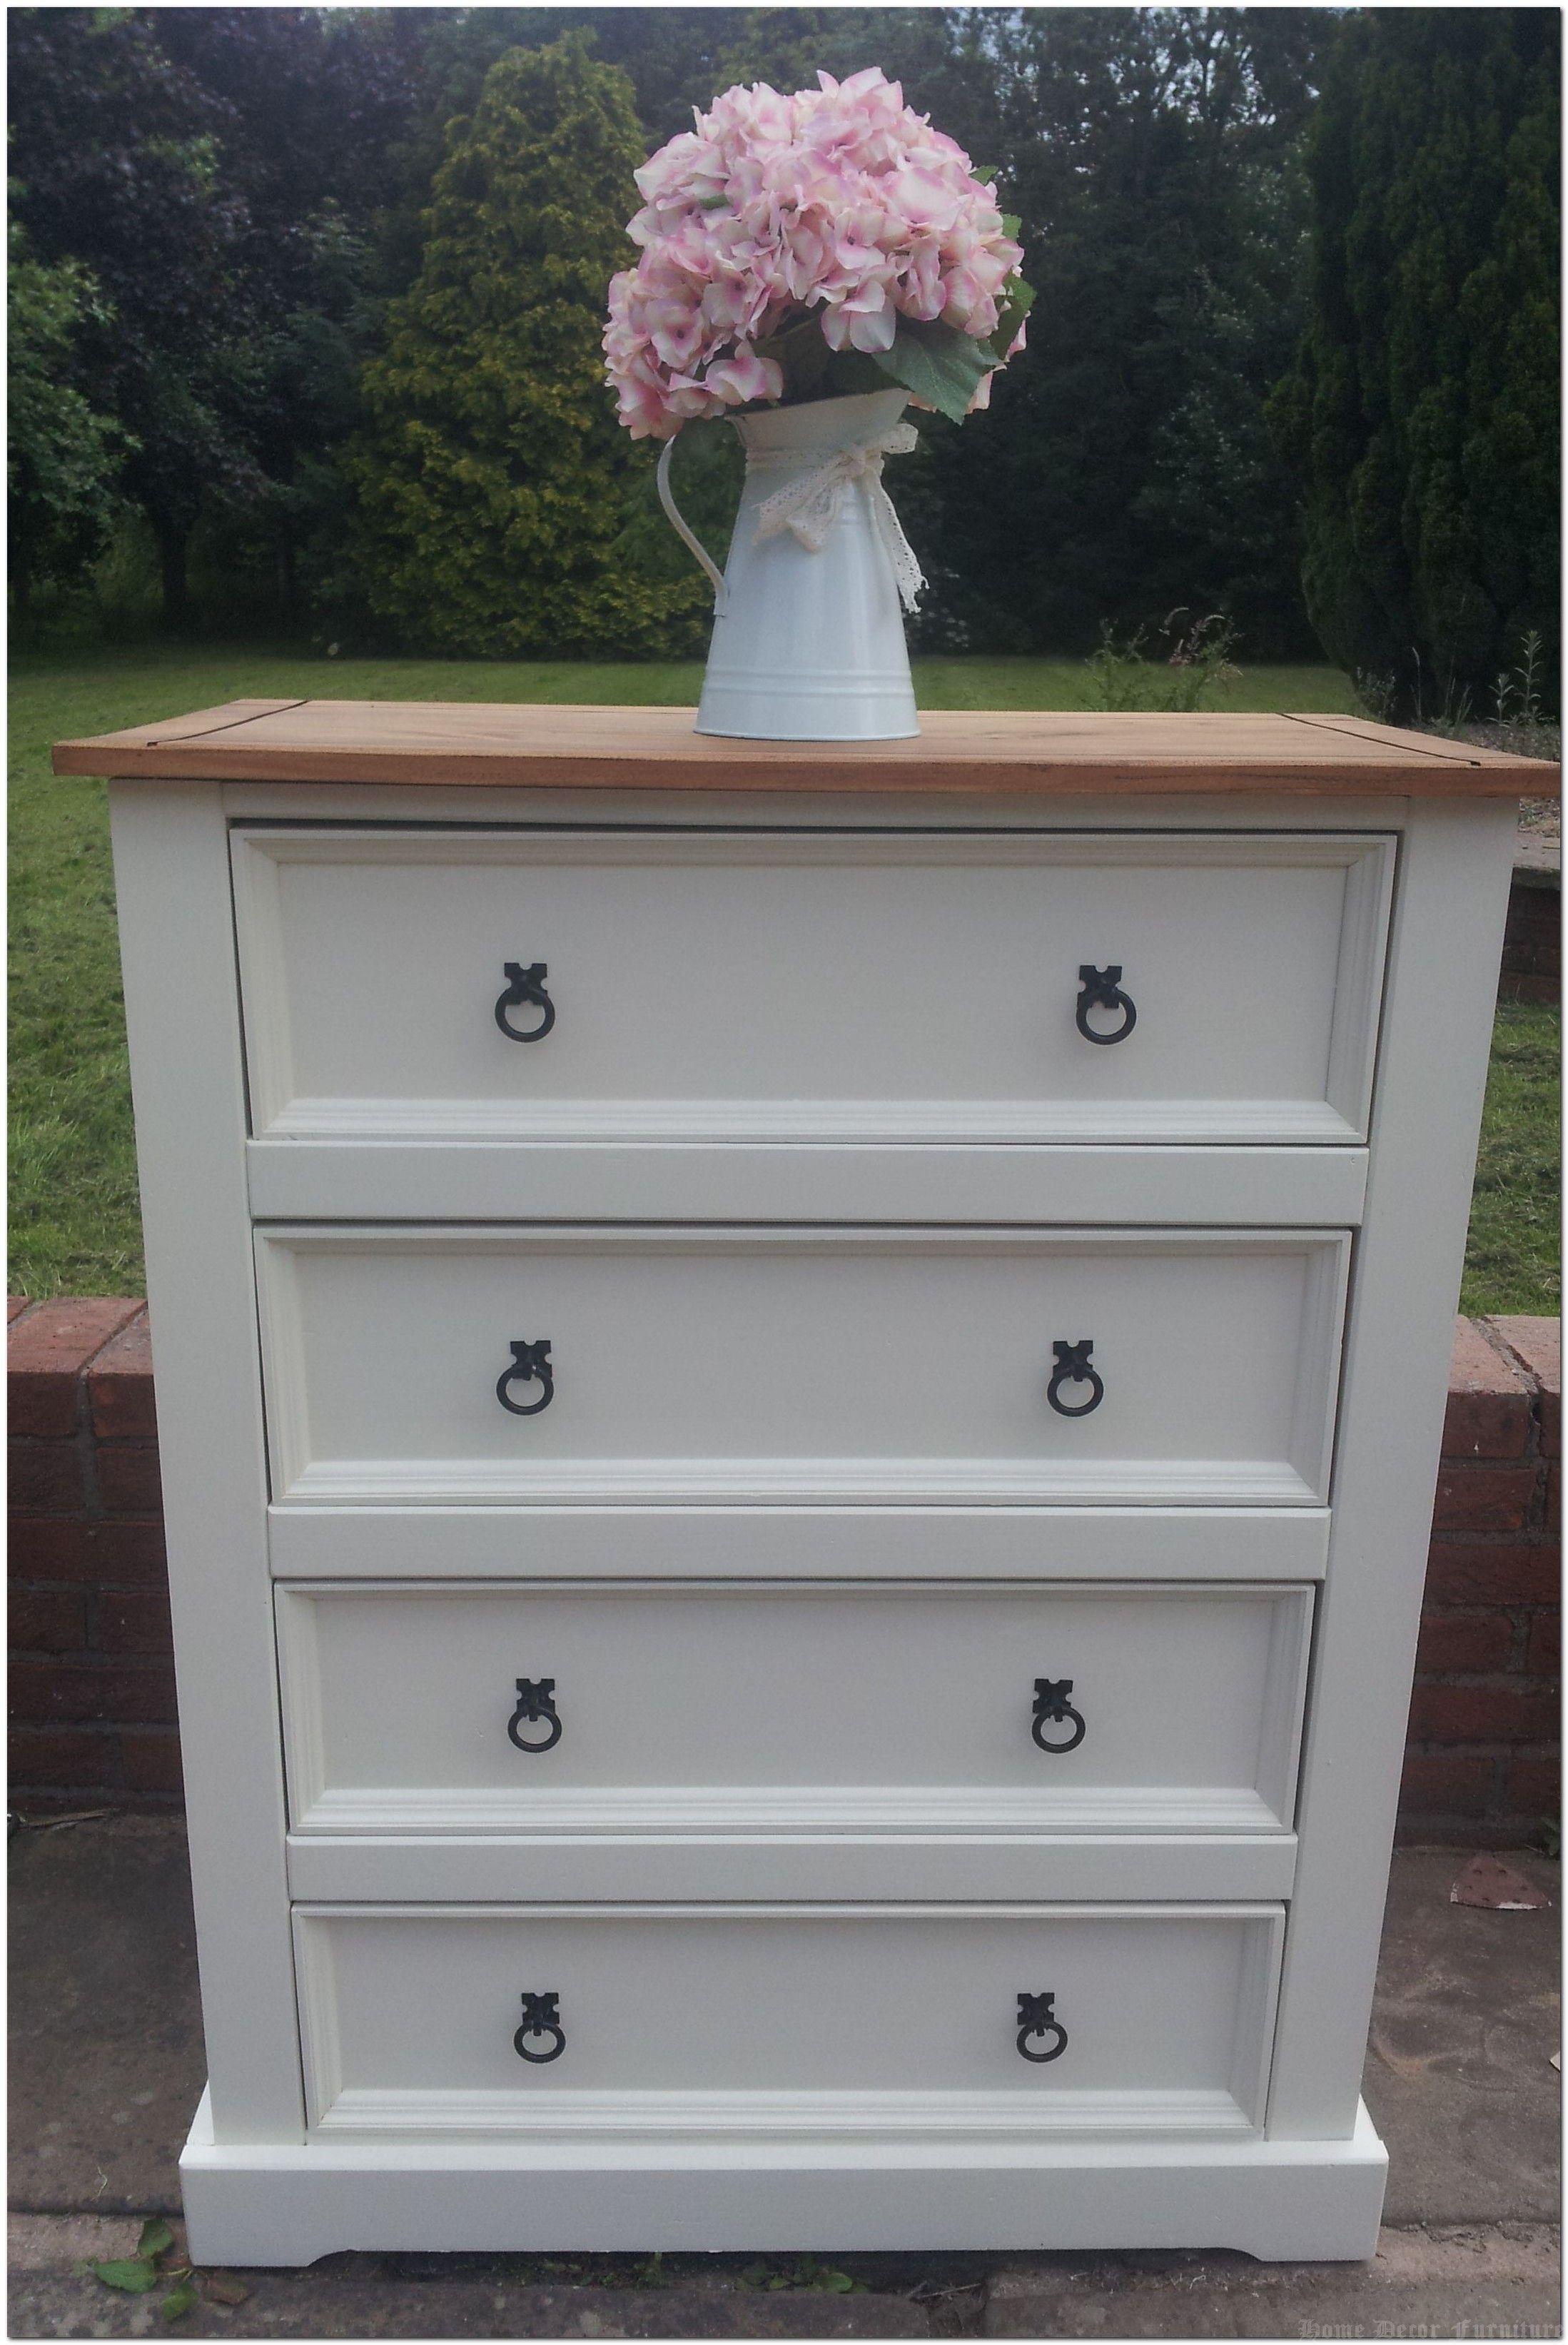 Improve Your Furniture Home Decor Skills